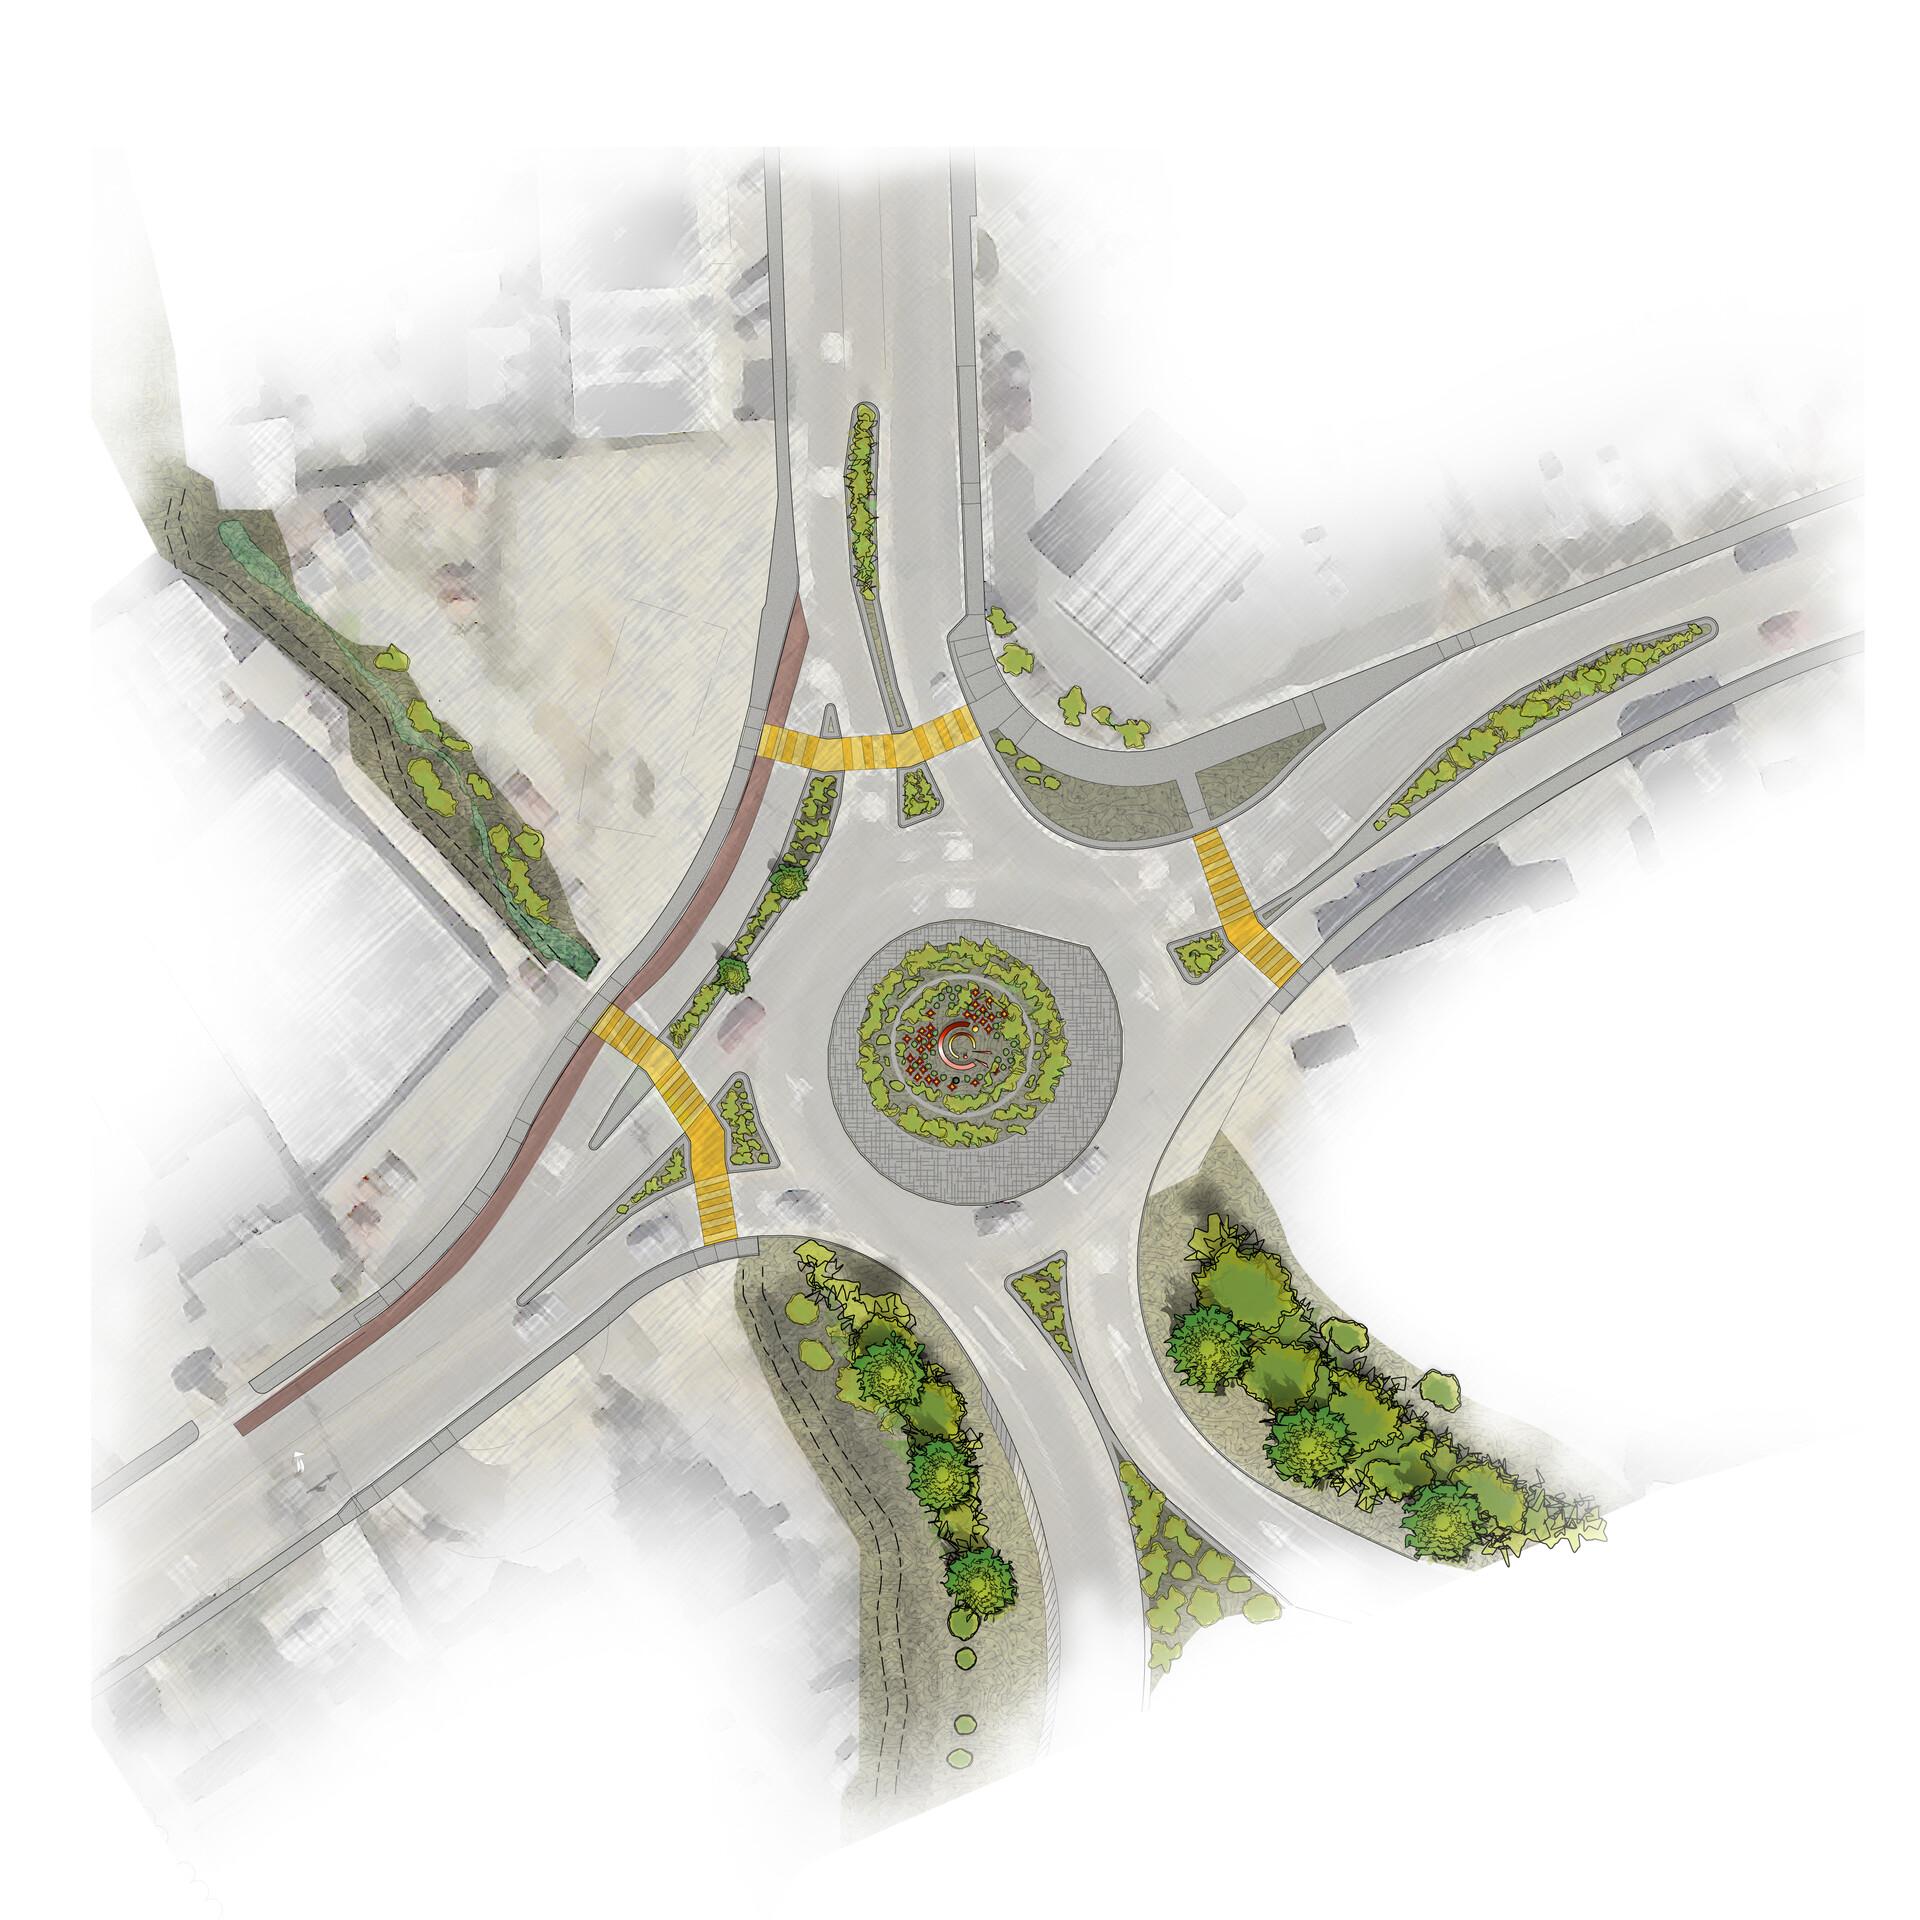 Gerard falla idaho maryland 04 main roundabout